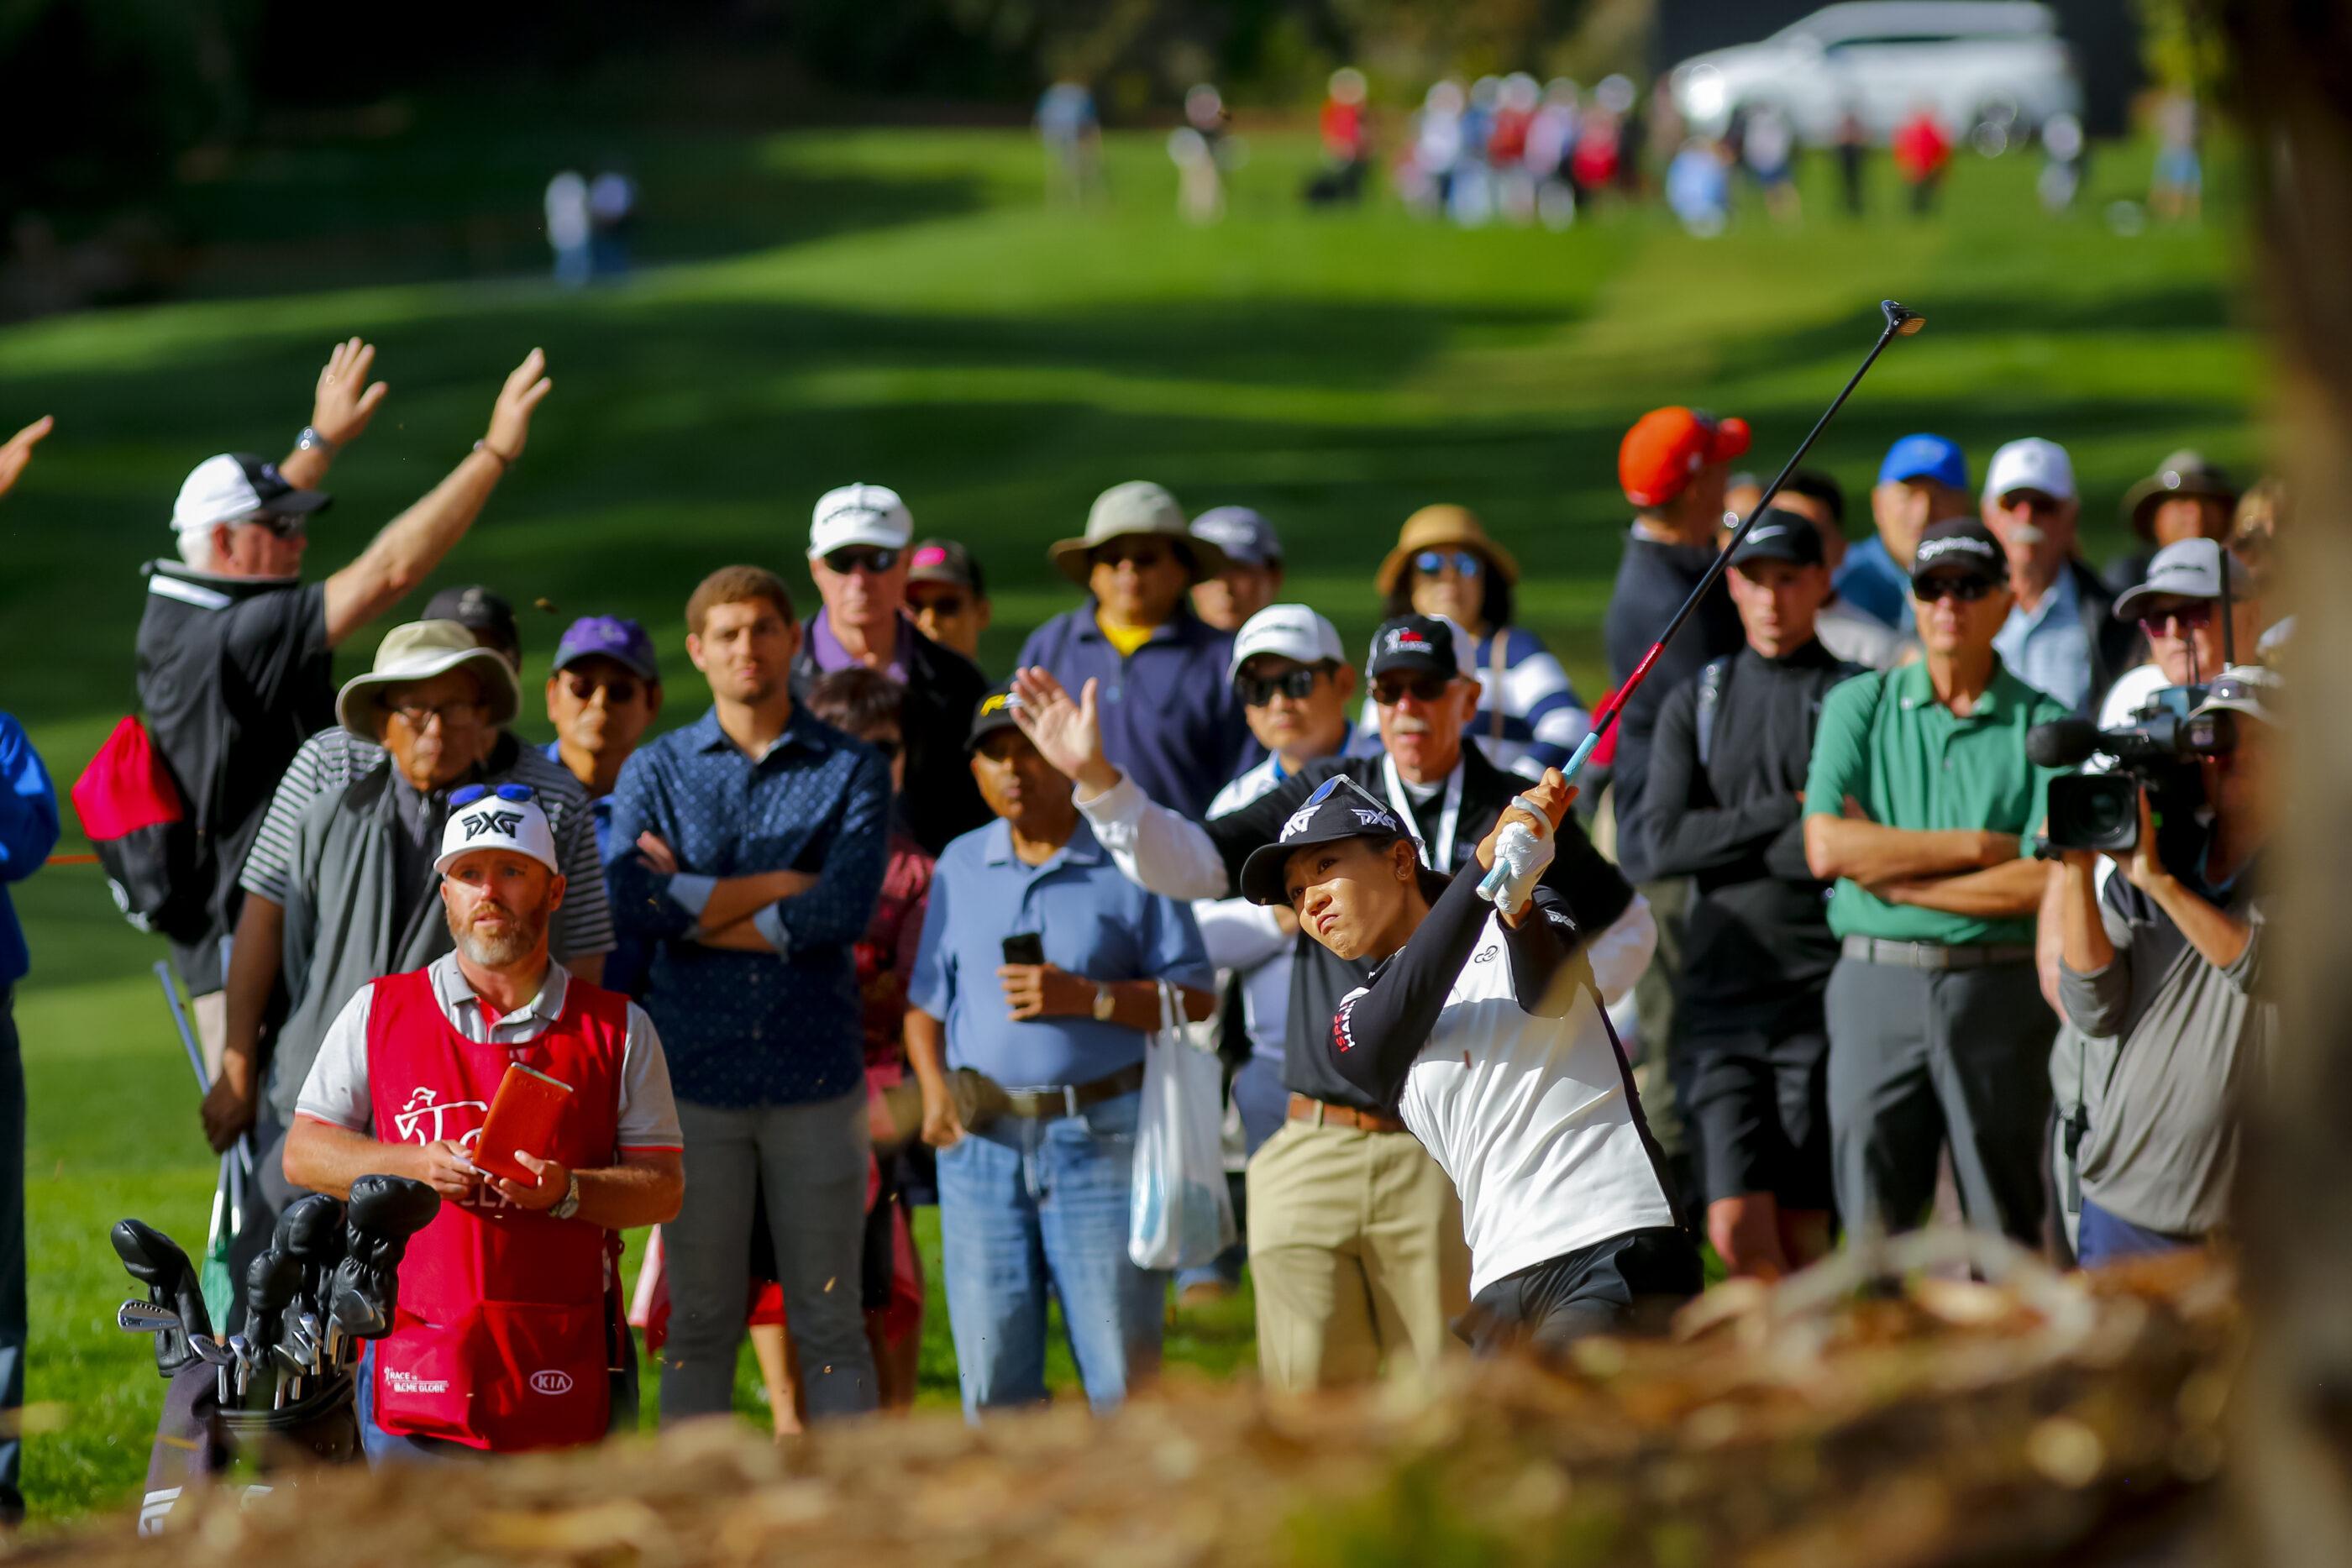 Kia Classic LPGA golf tournament in Carlsbad, California.